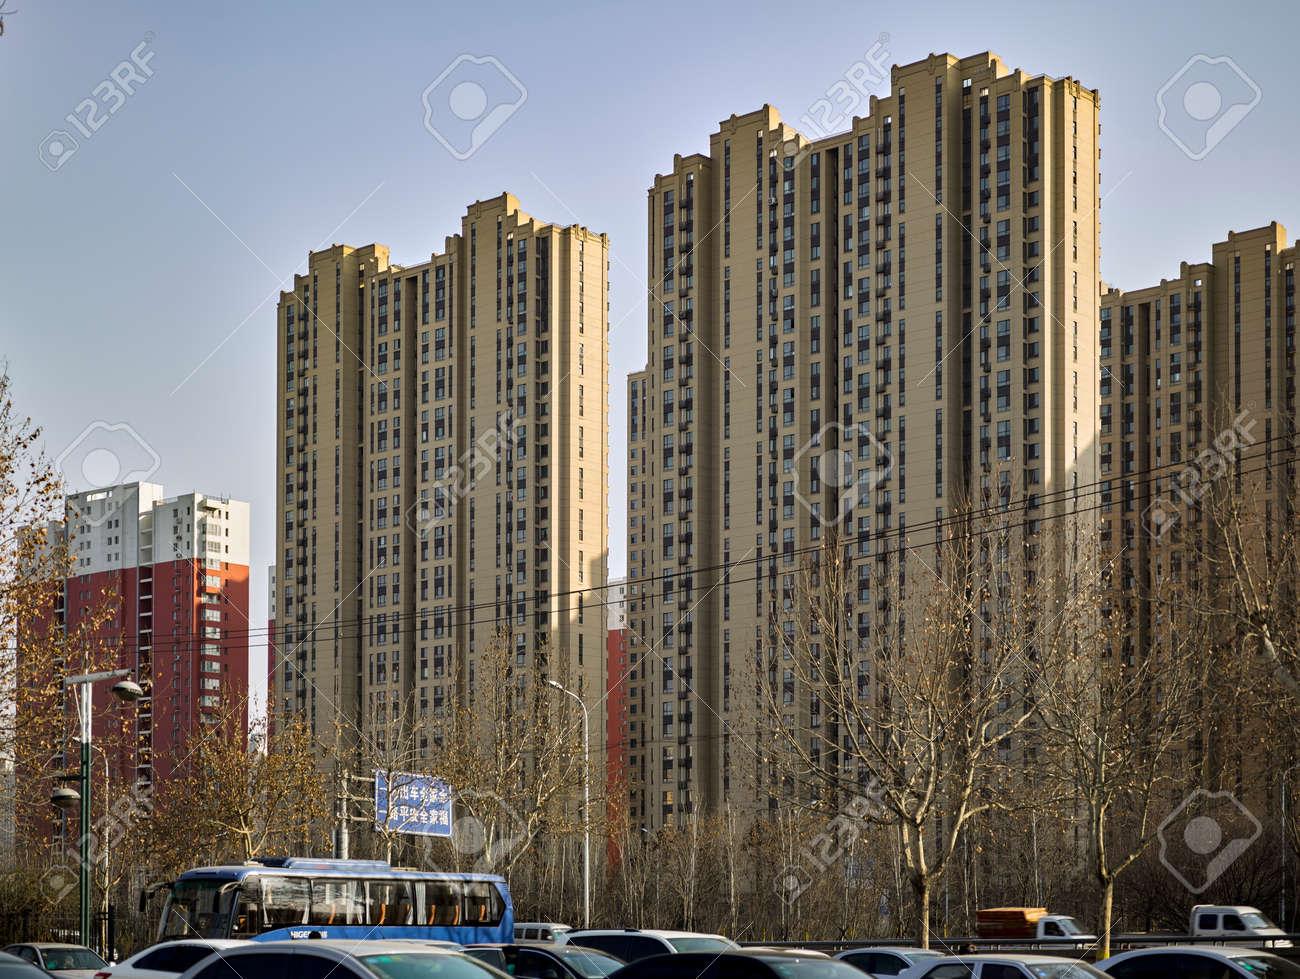 中国石家荘市省河北市 の写真素材・画像素材 Image 82711425.